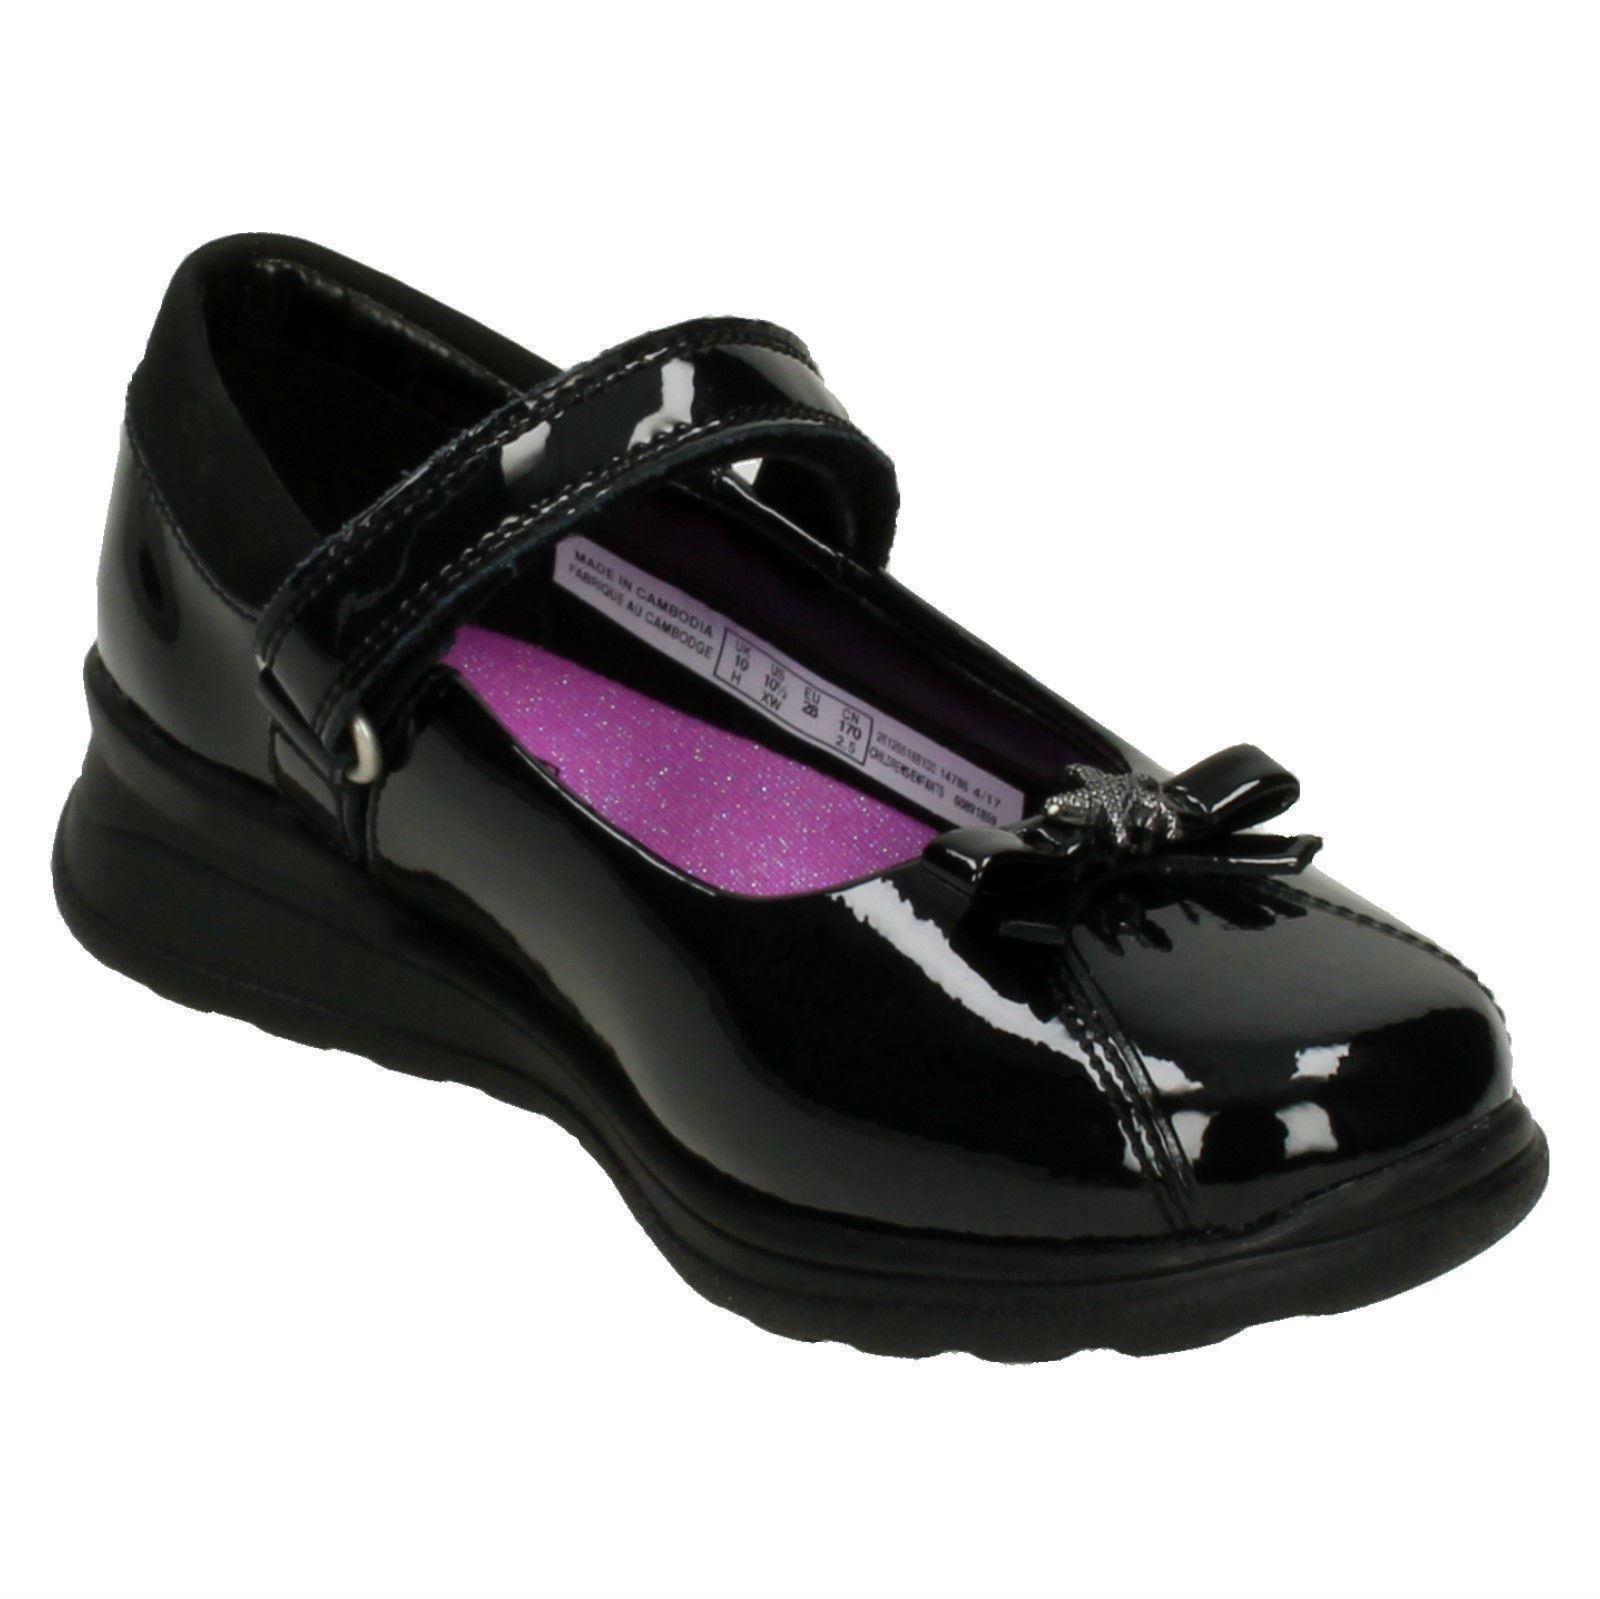 /'Girls Gloforms By Clarks/' Bow Trim School Shoes Mariel Wish Inf